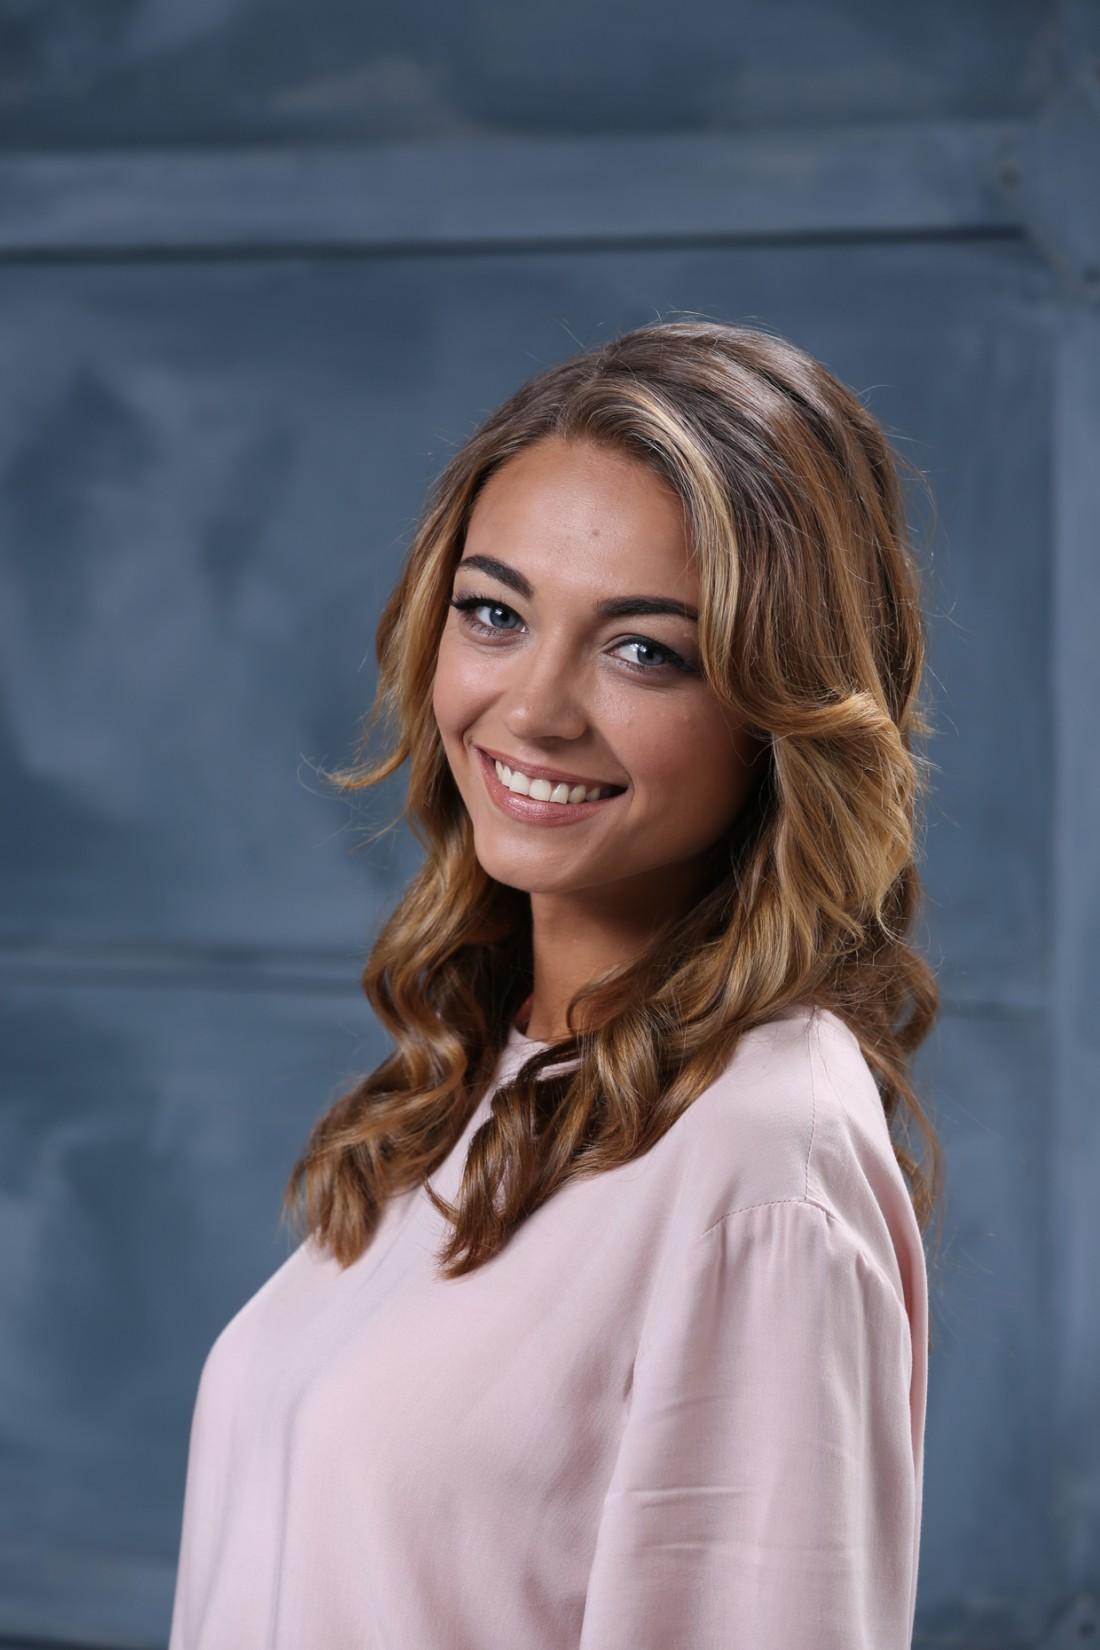 Холостяк 6 сезон: Алина